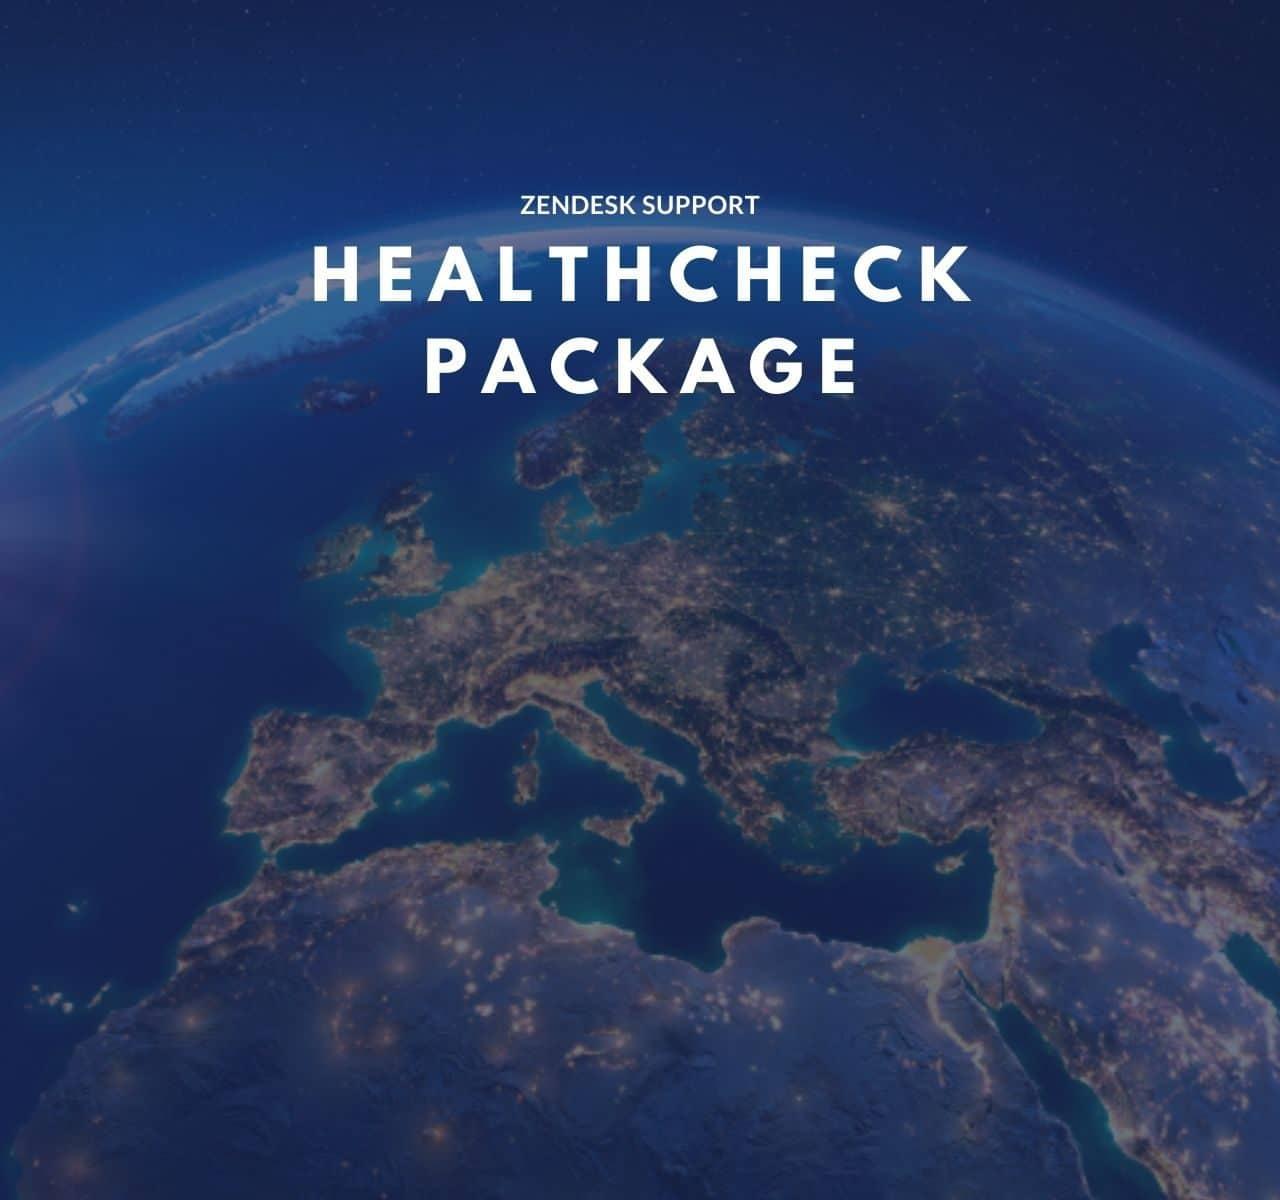 Zendesk Support - Healthcheck Package